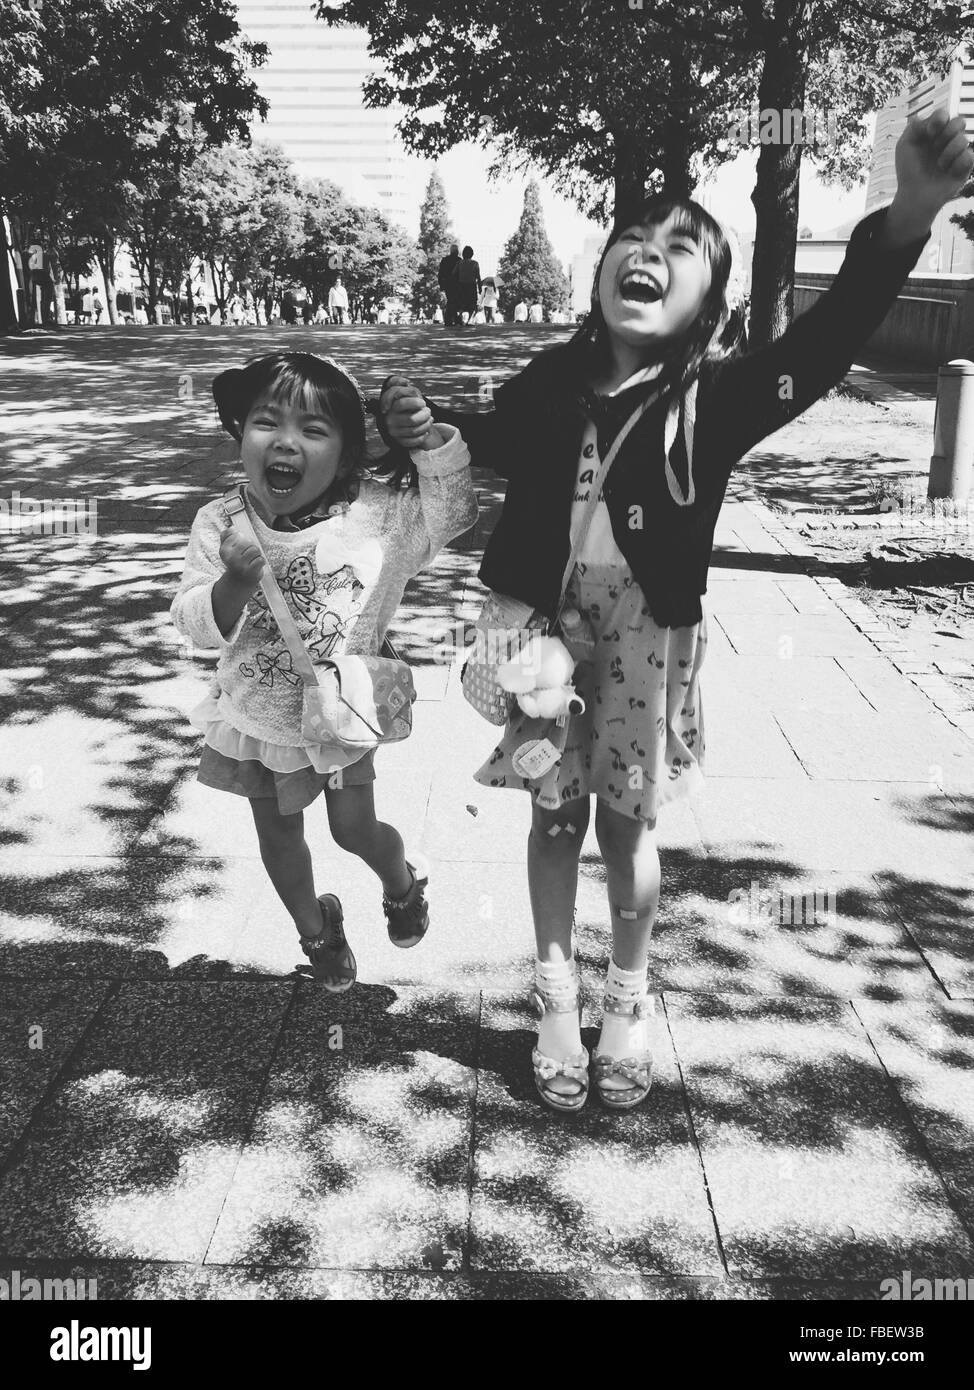 Feliz Hermanas de pie en la pasarela Imagen De Stock